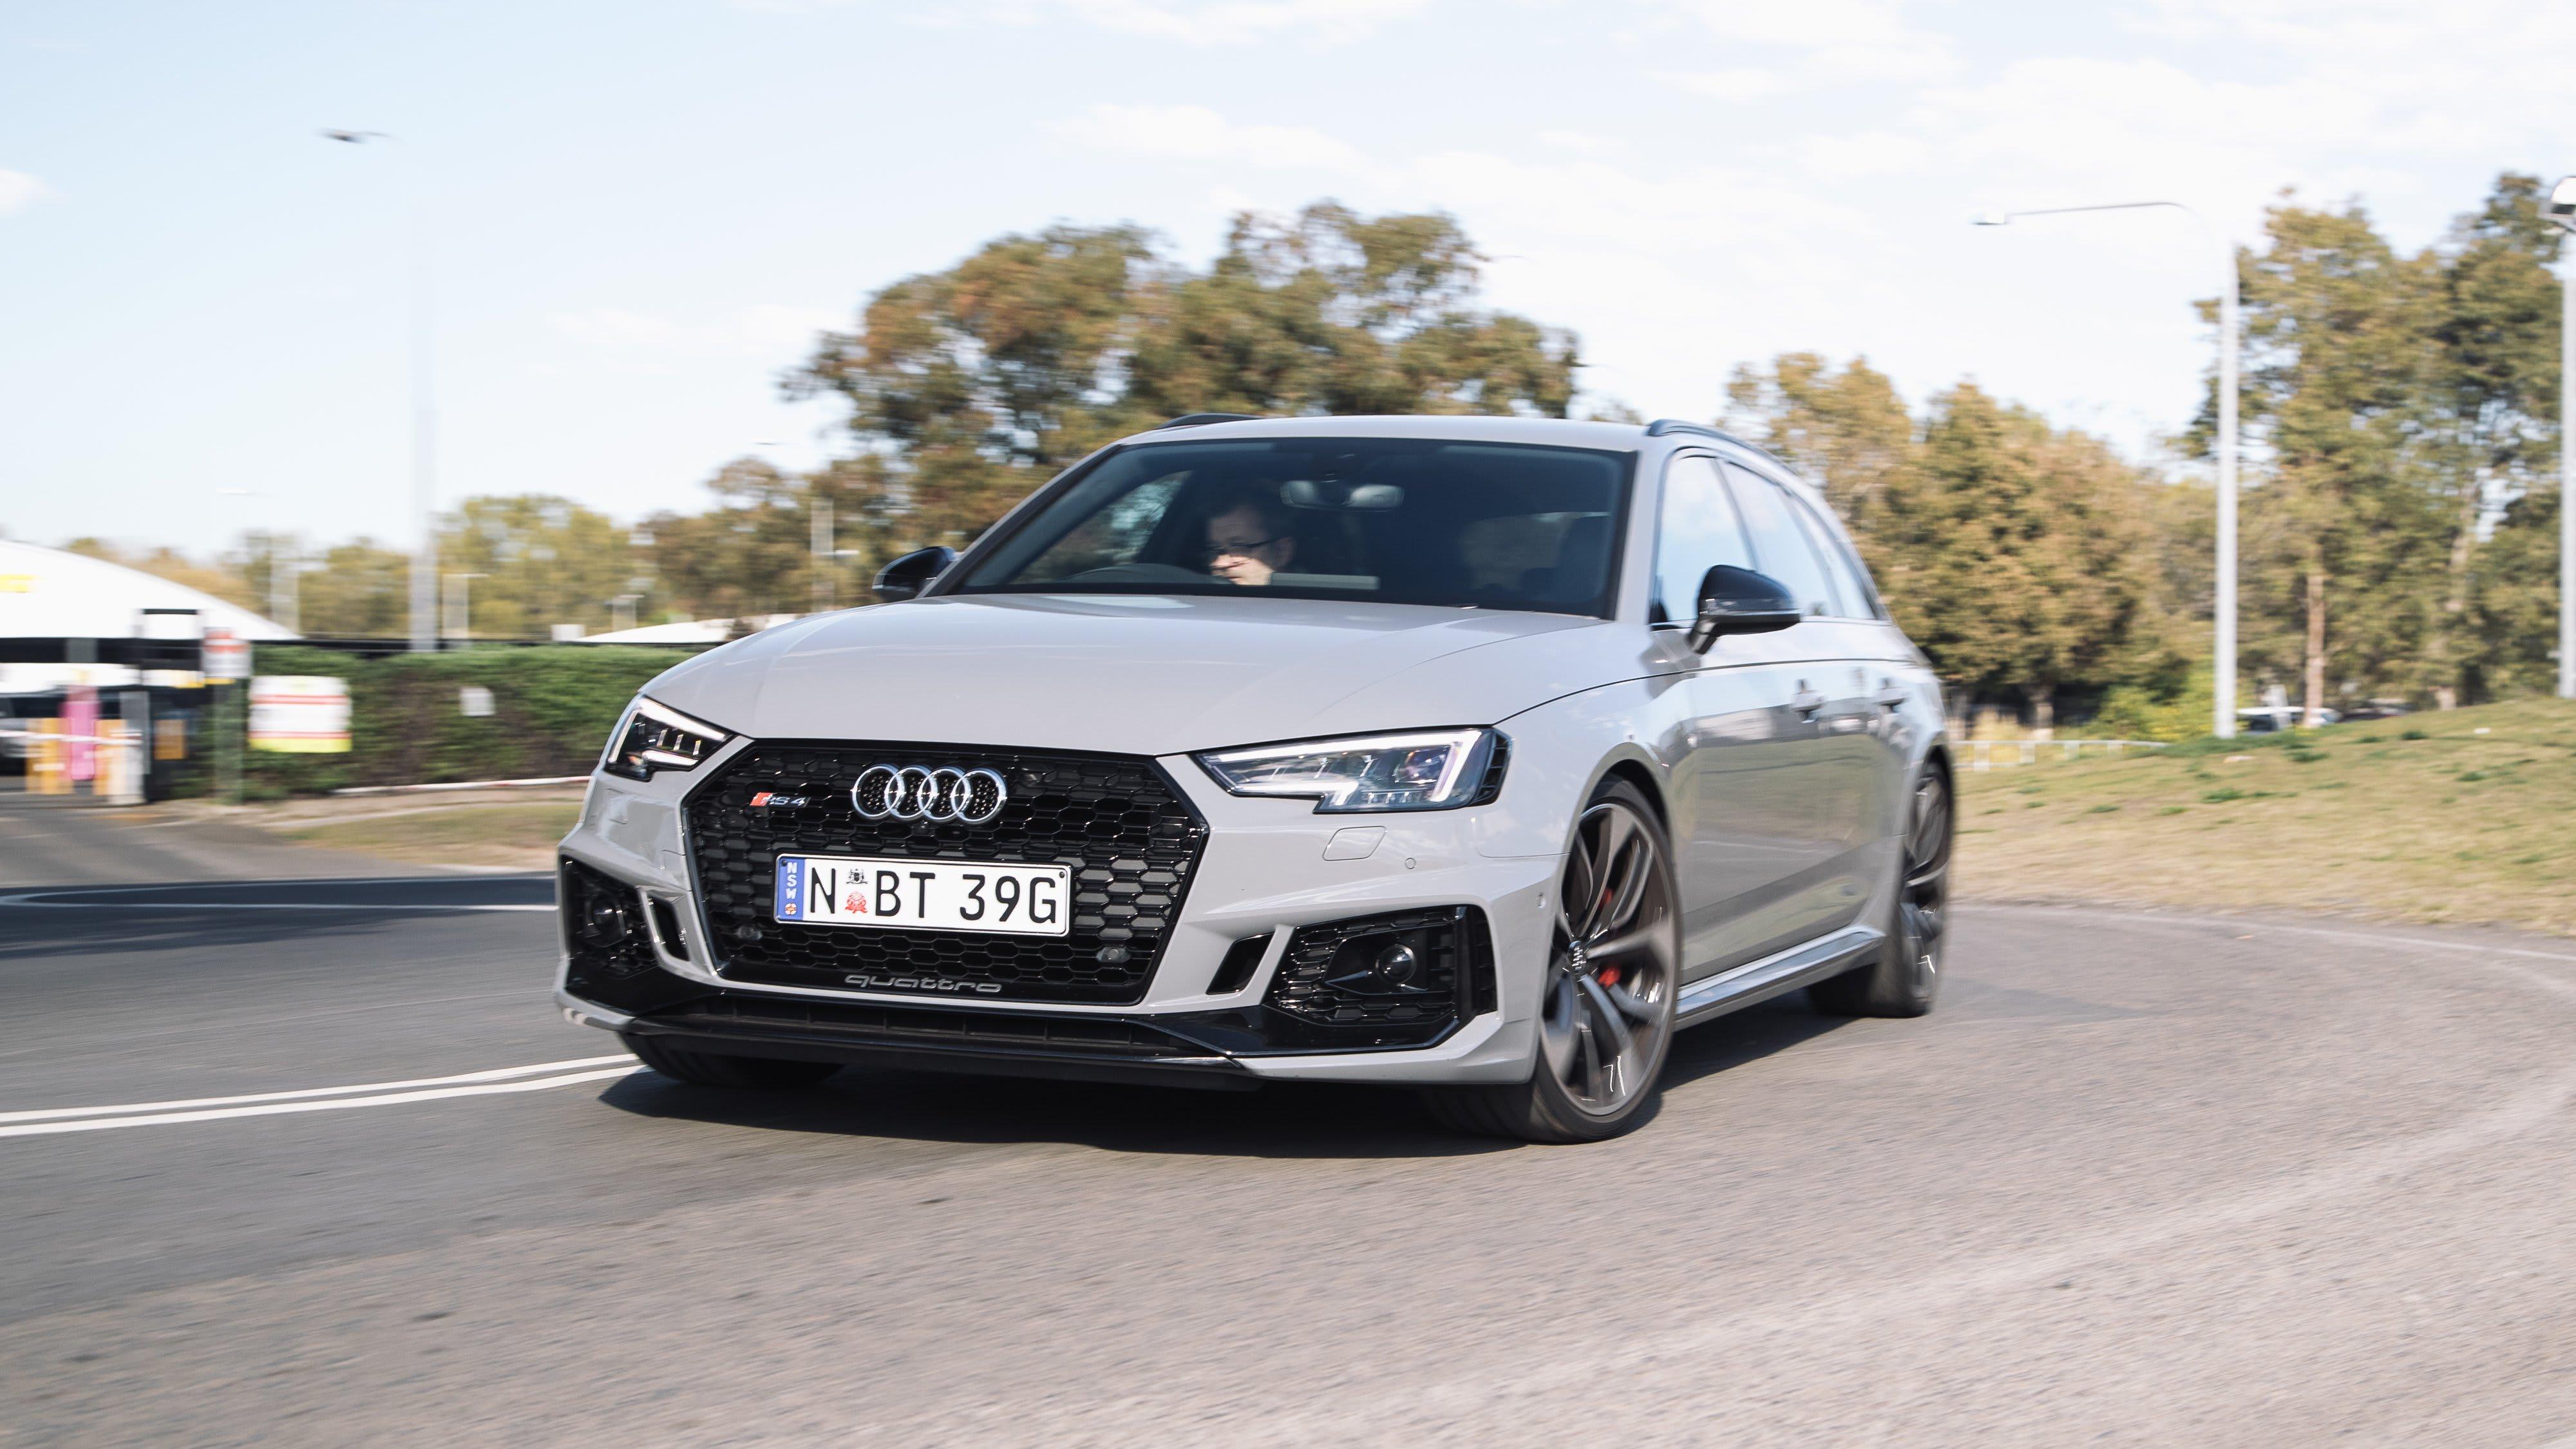 2018 Audi RS4 Avant 42 1